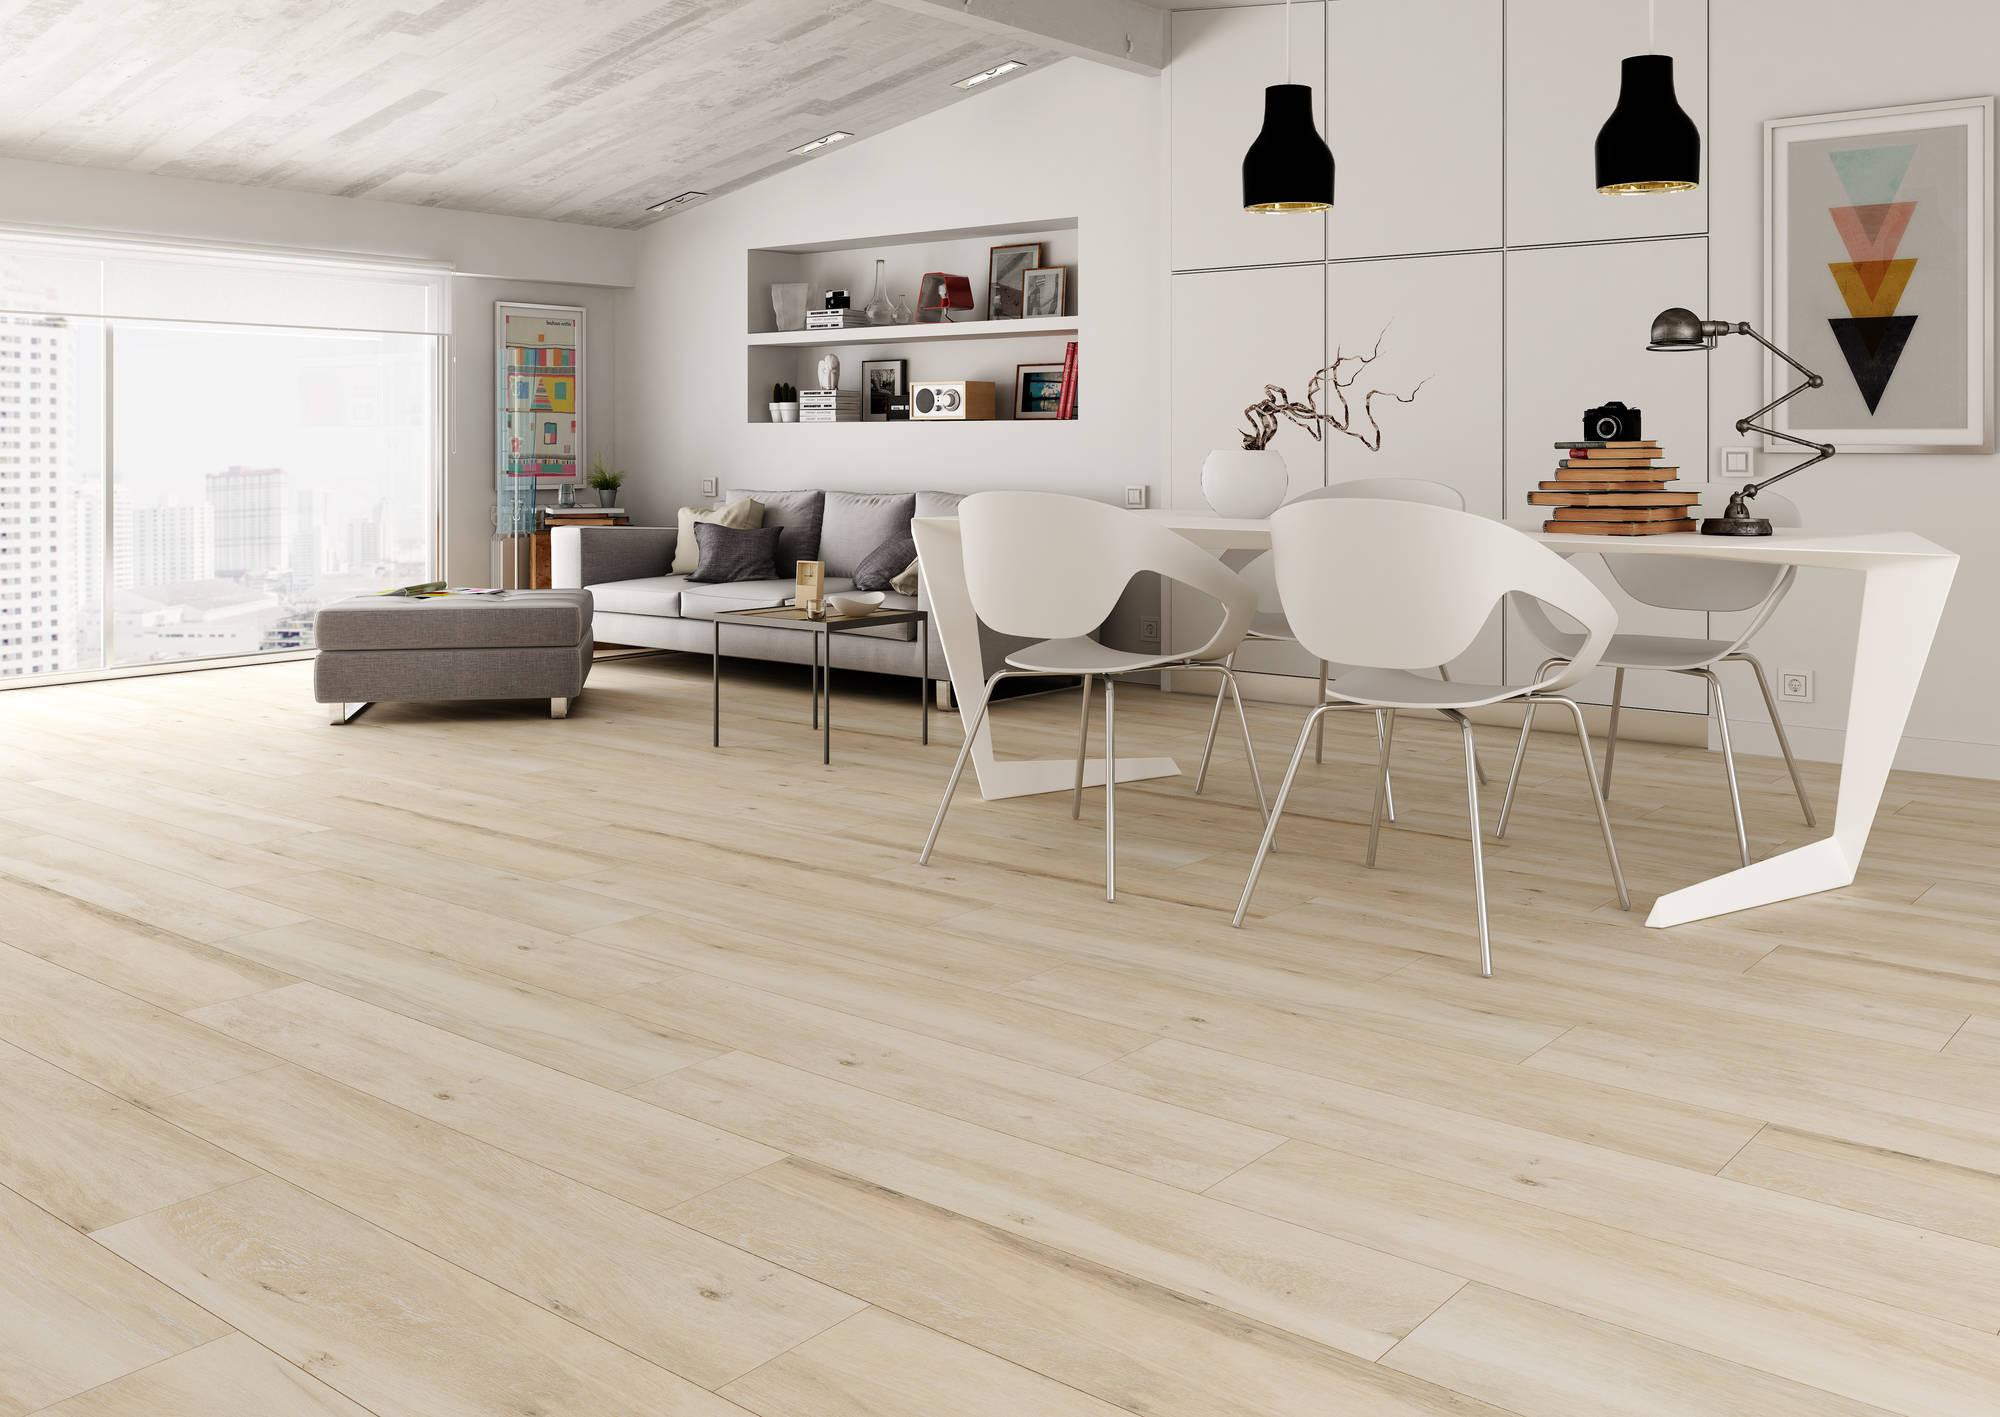 Vloertegel El Halcon Atelier 15,4x60 cm Beige 0,93 M2